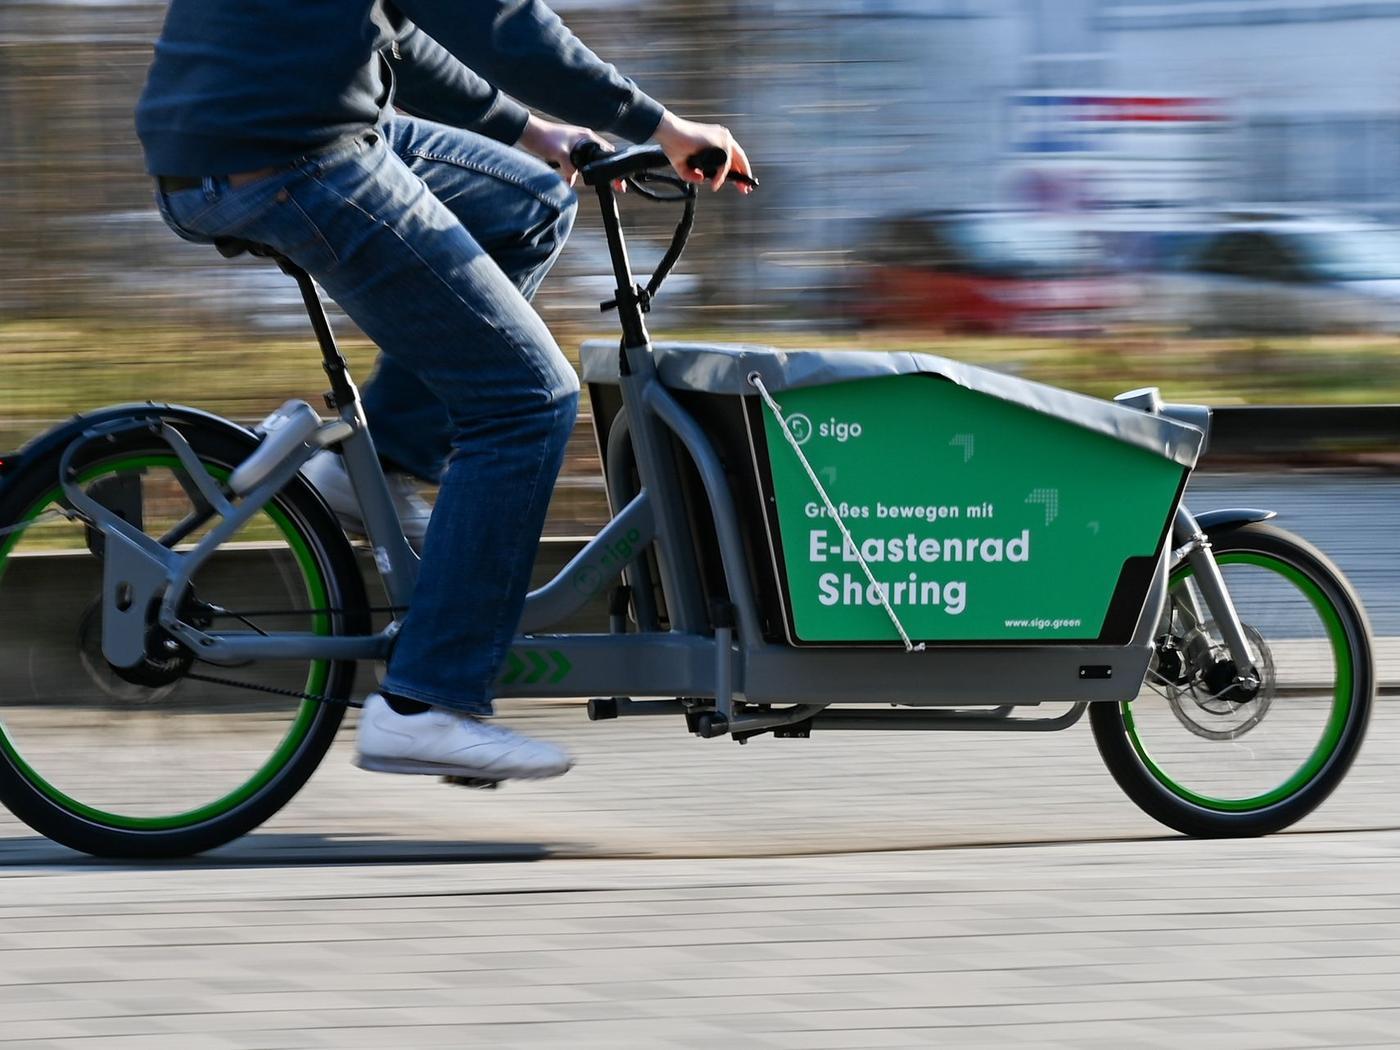 Sigo E-Lastenrad-Sharing keine Anmeldegebühr